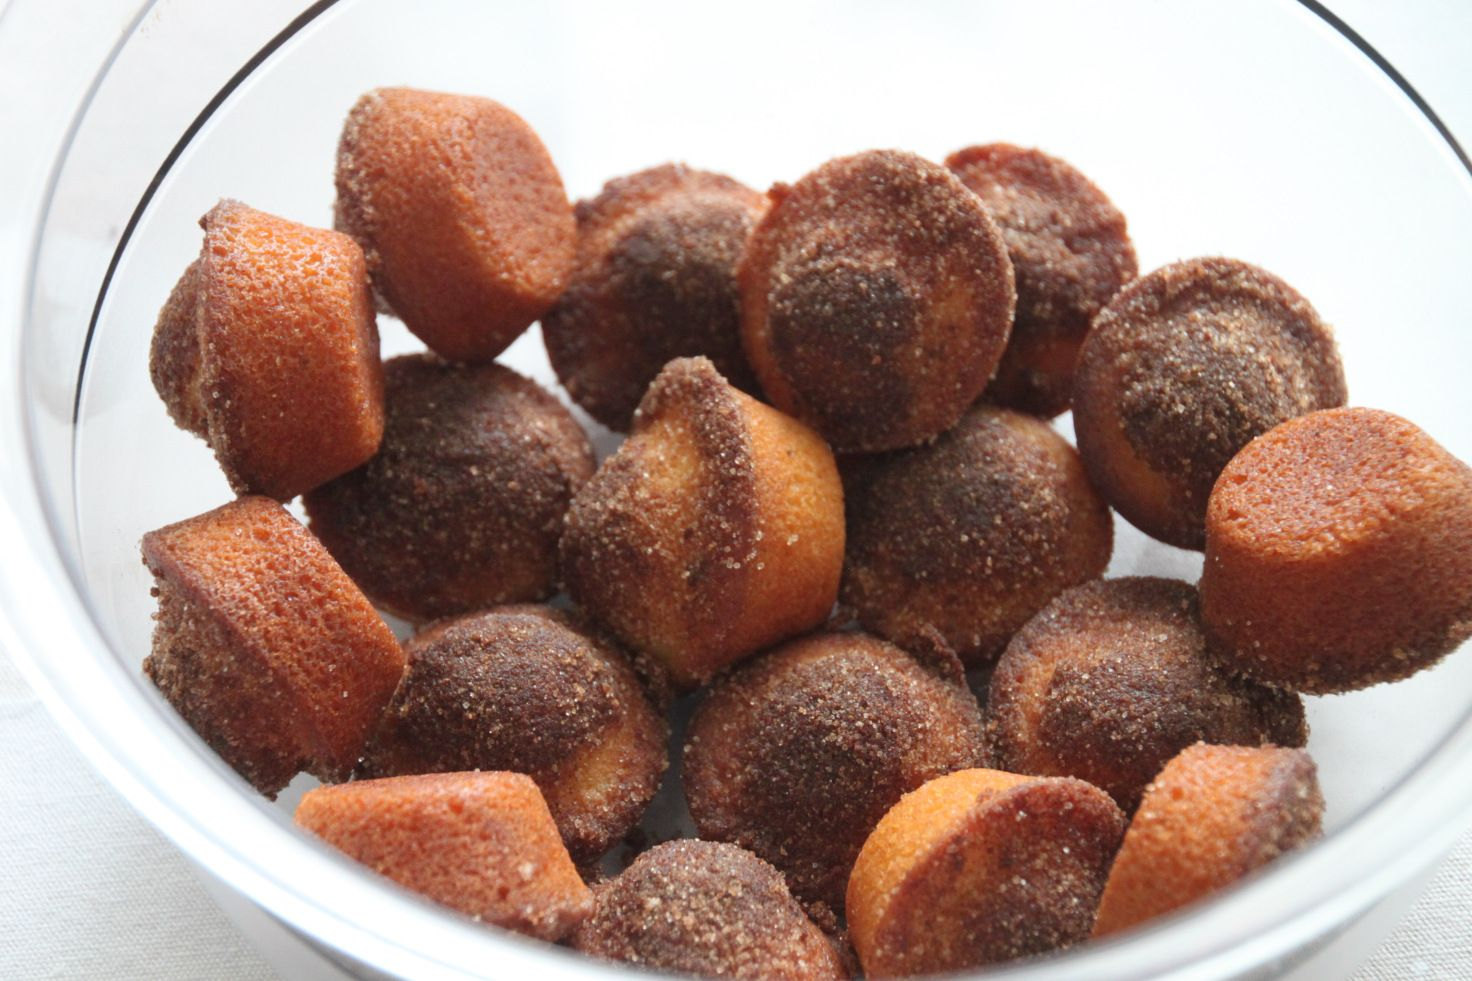 karnemelk mini muffins